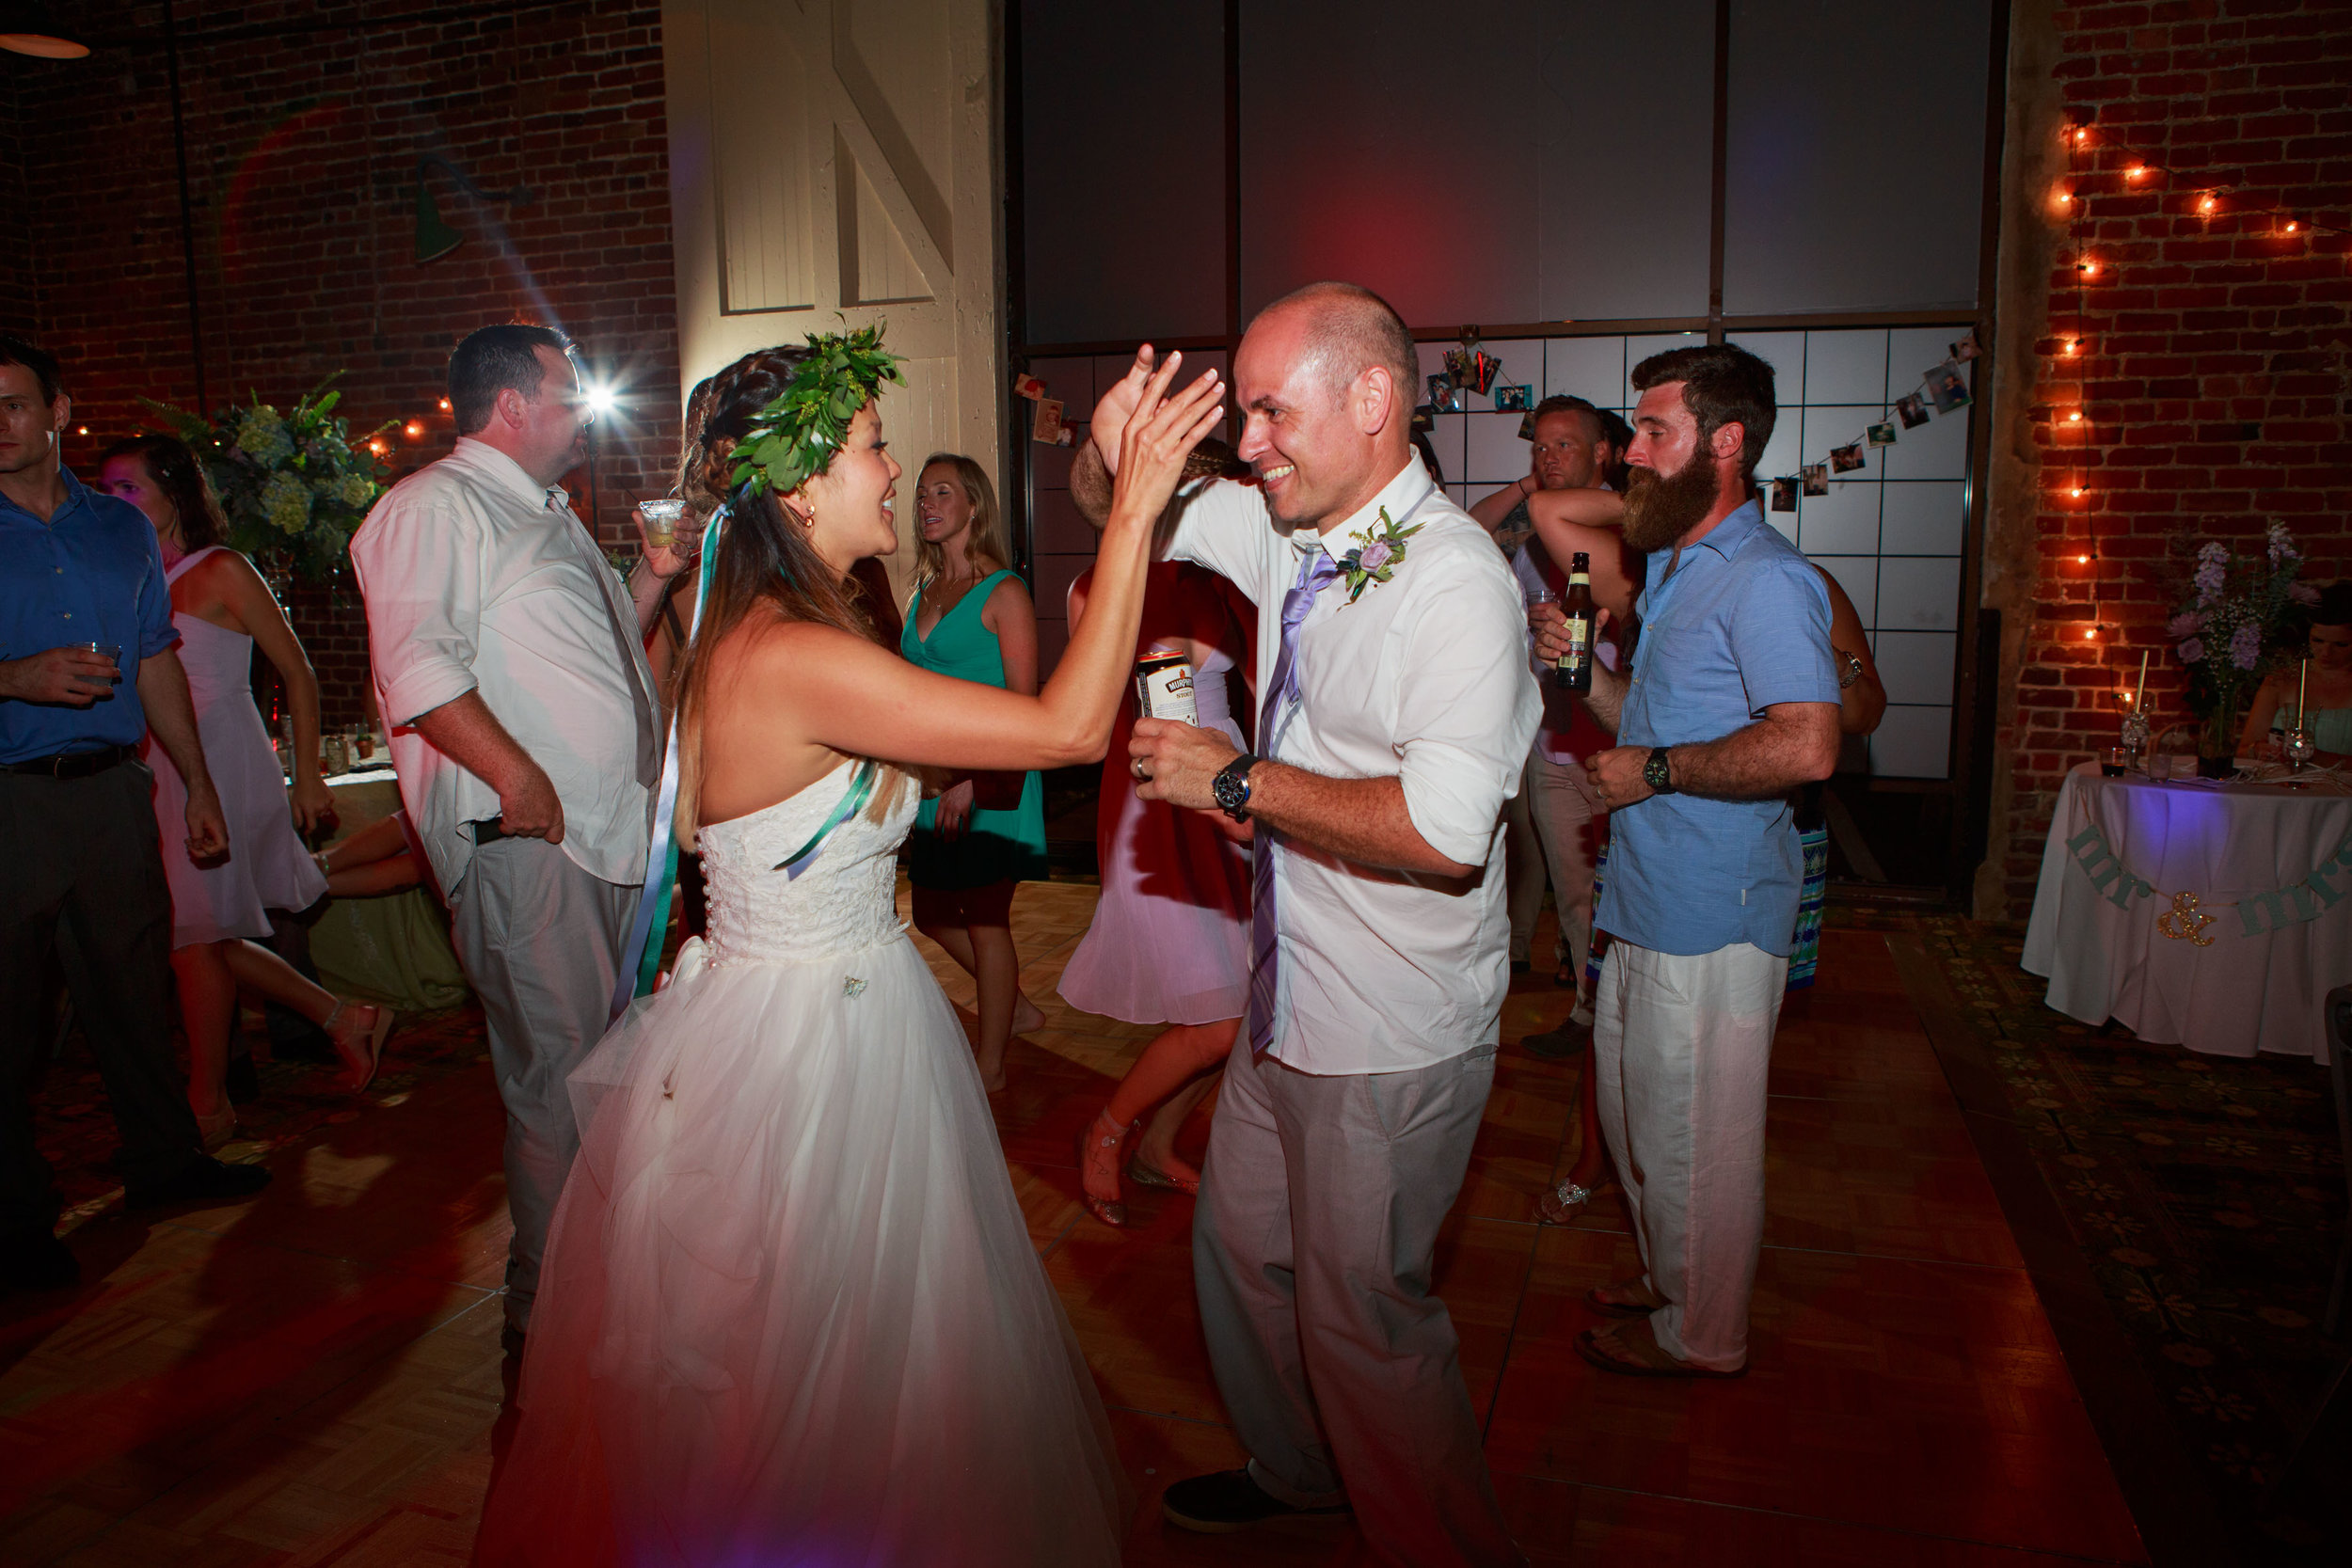 North_Carolina_Wedding_Photographer_Tiffany_Abruzzo_Reception_305.jpg